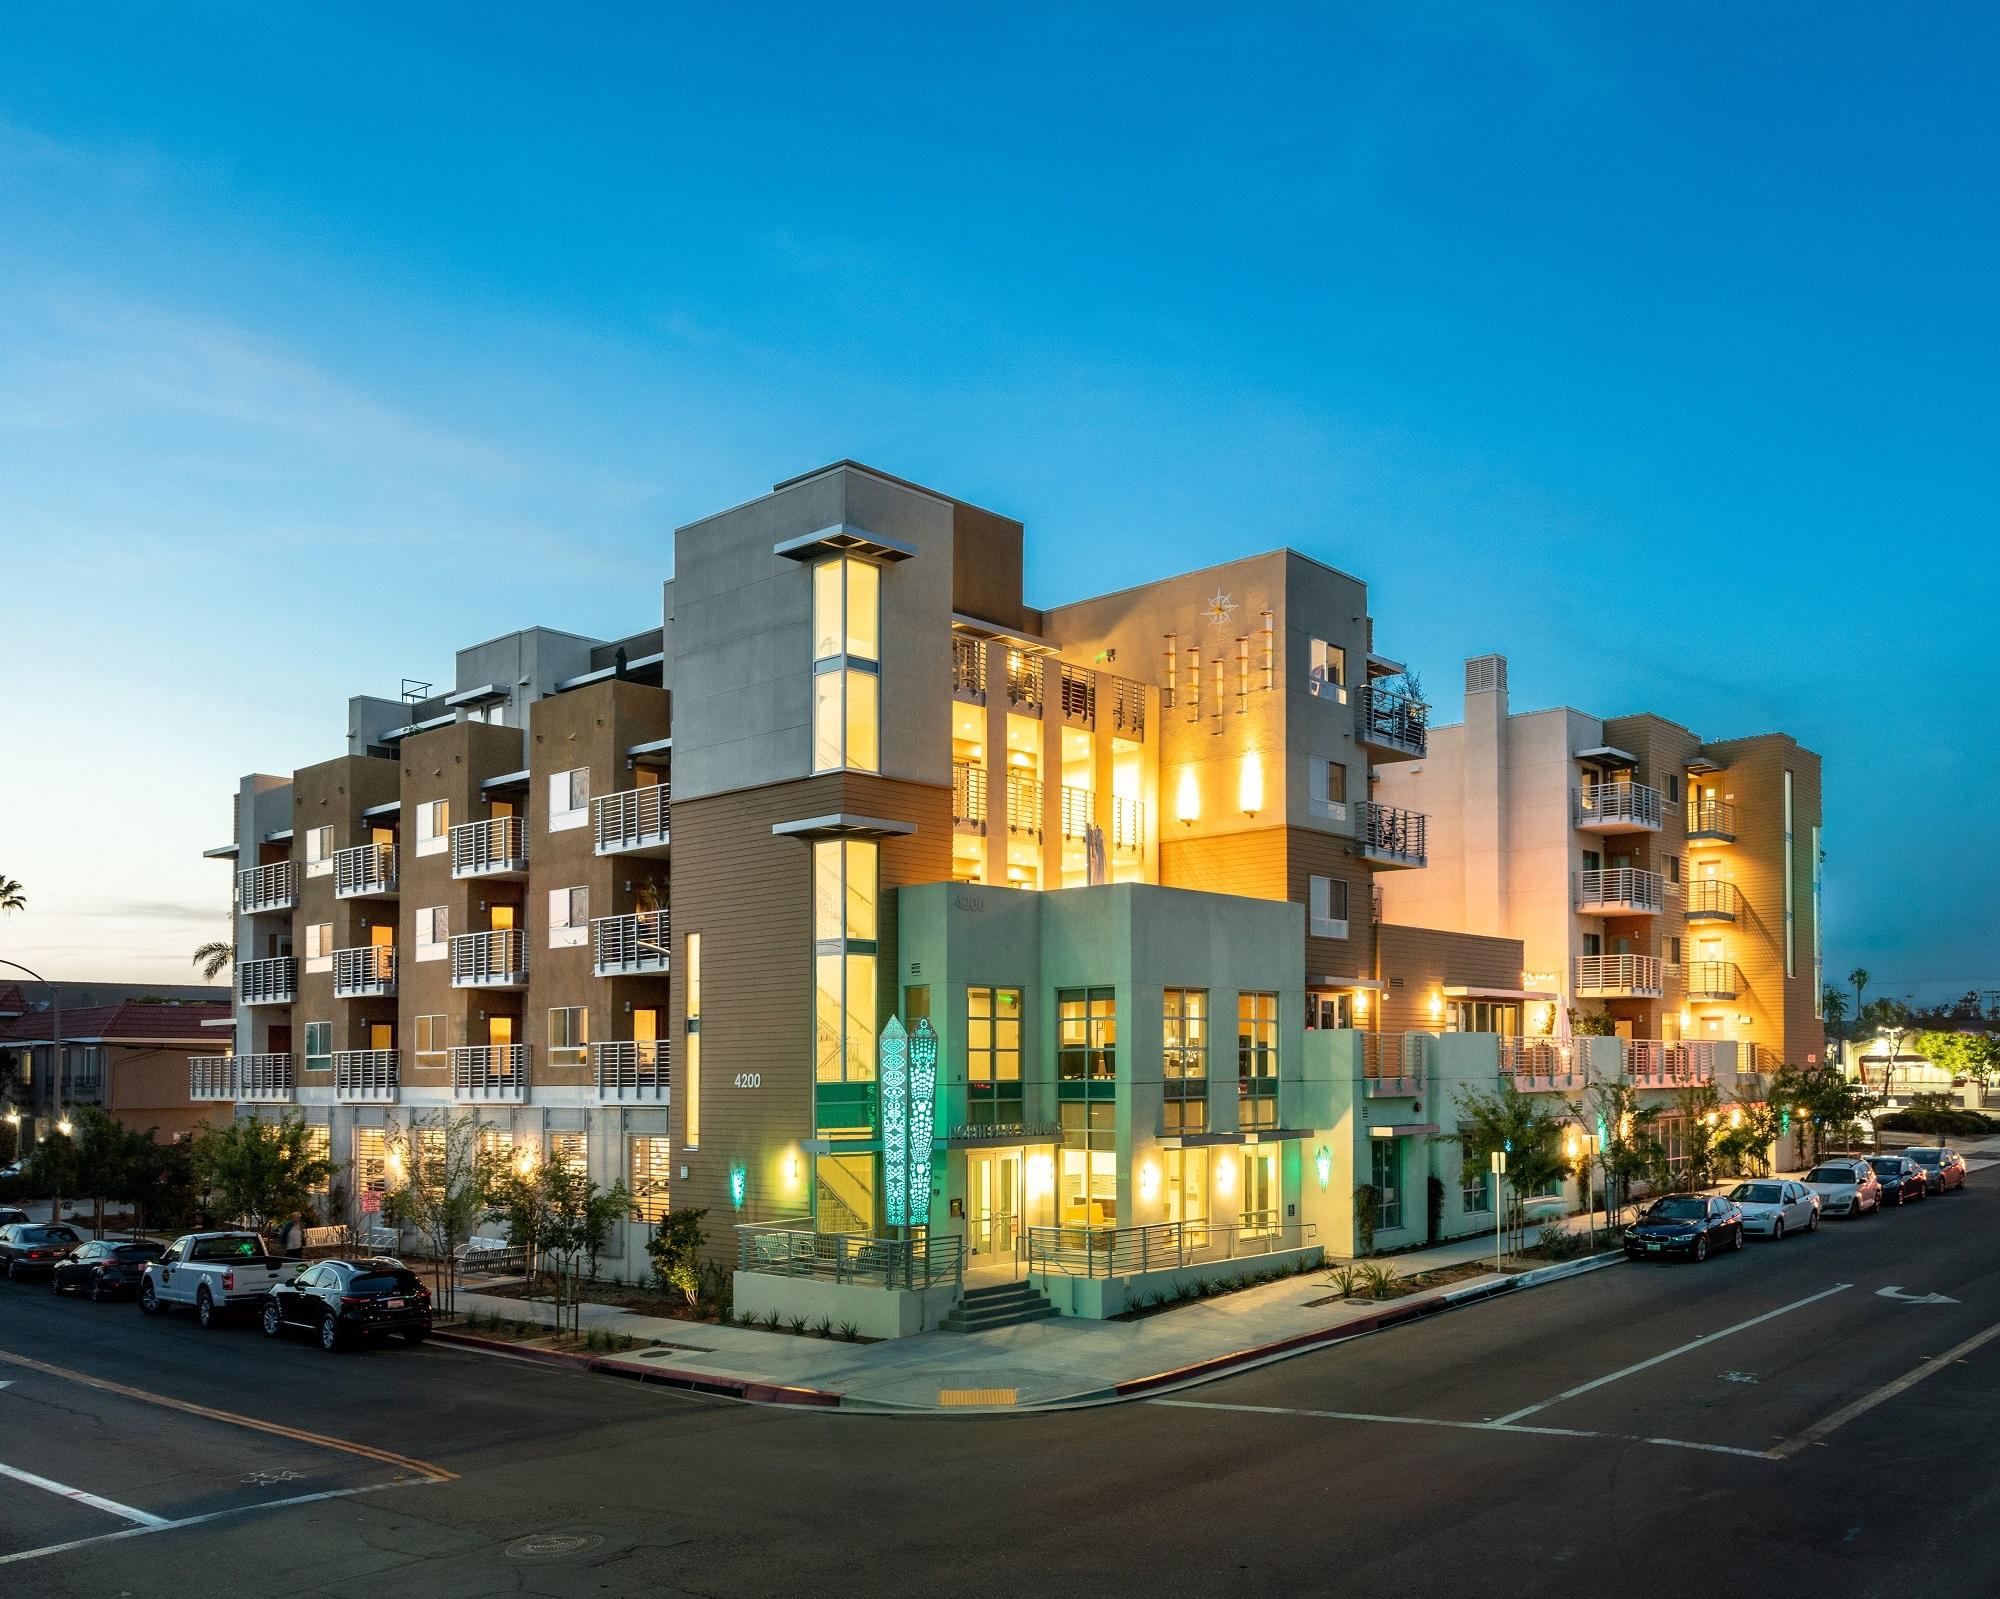 Homes for LGBT Seniors Open in San Diego| Housing Finance ...